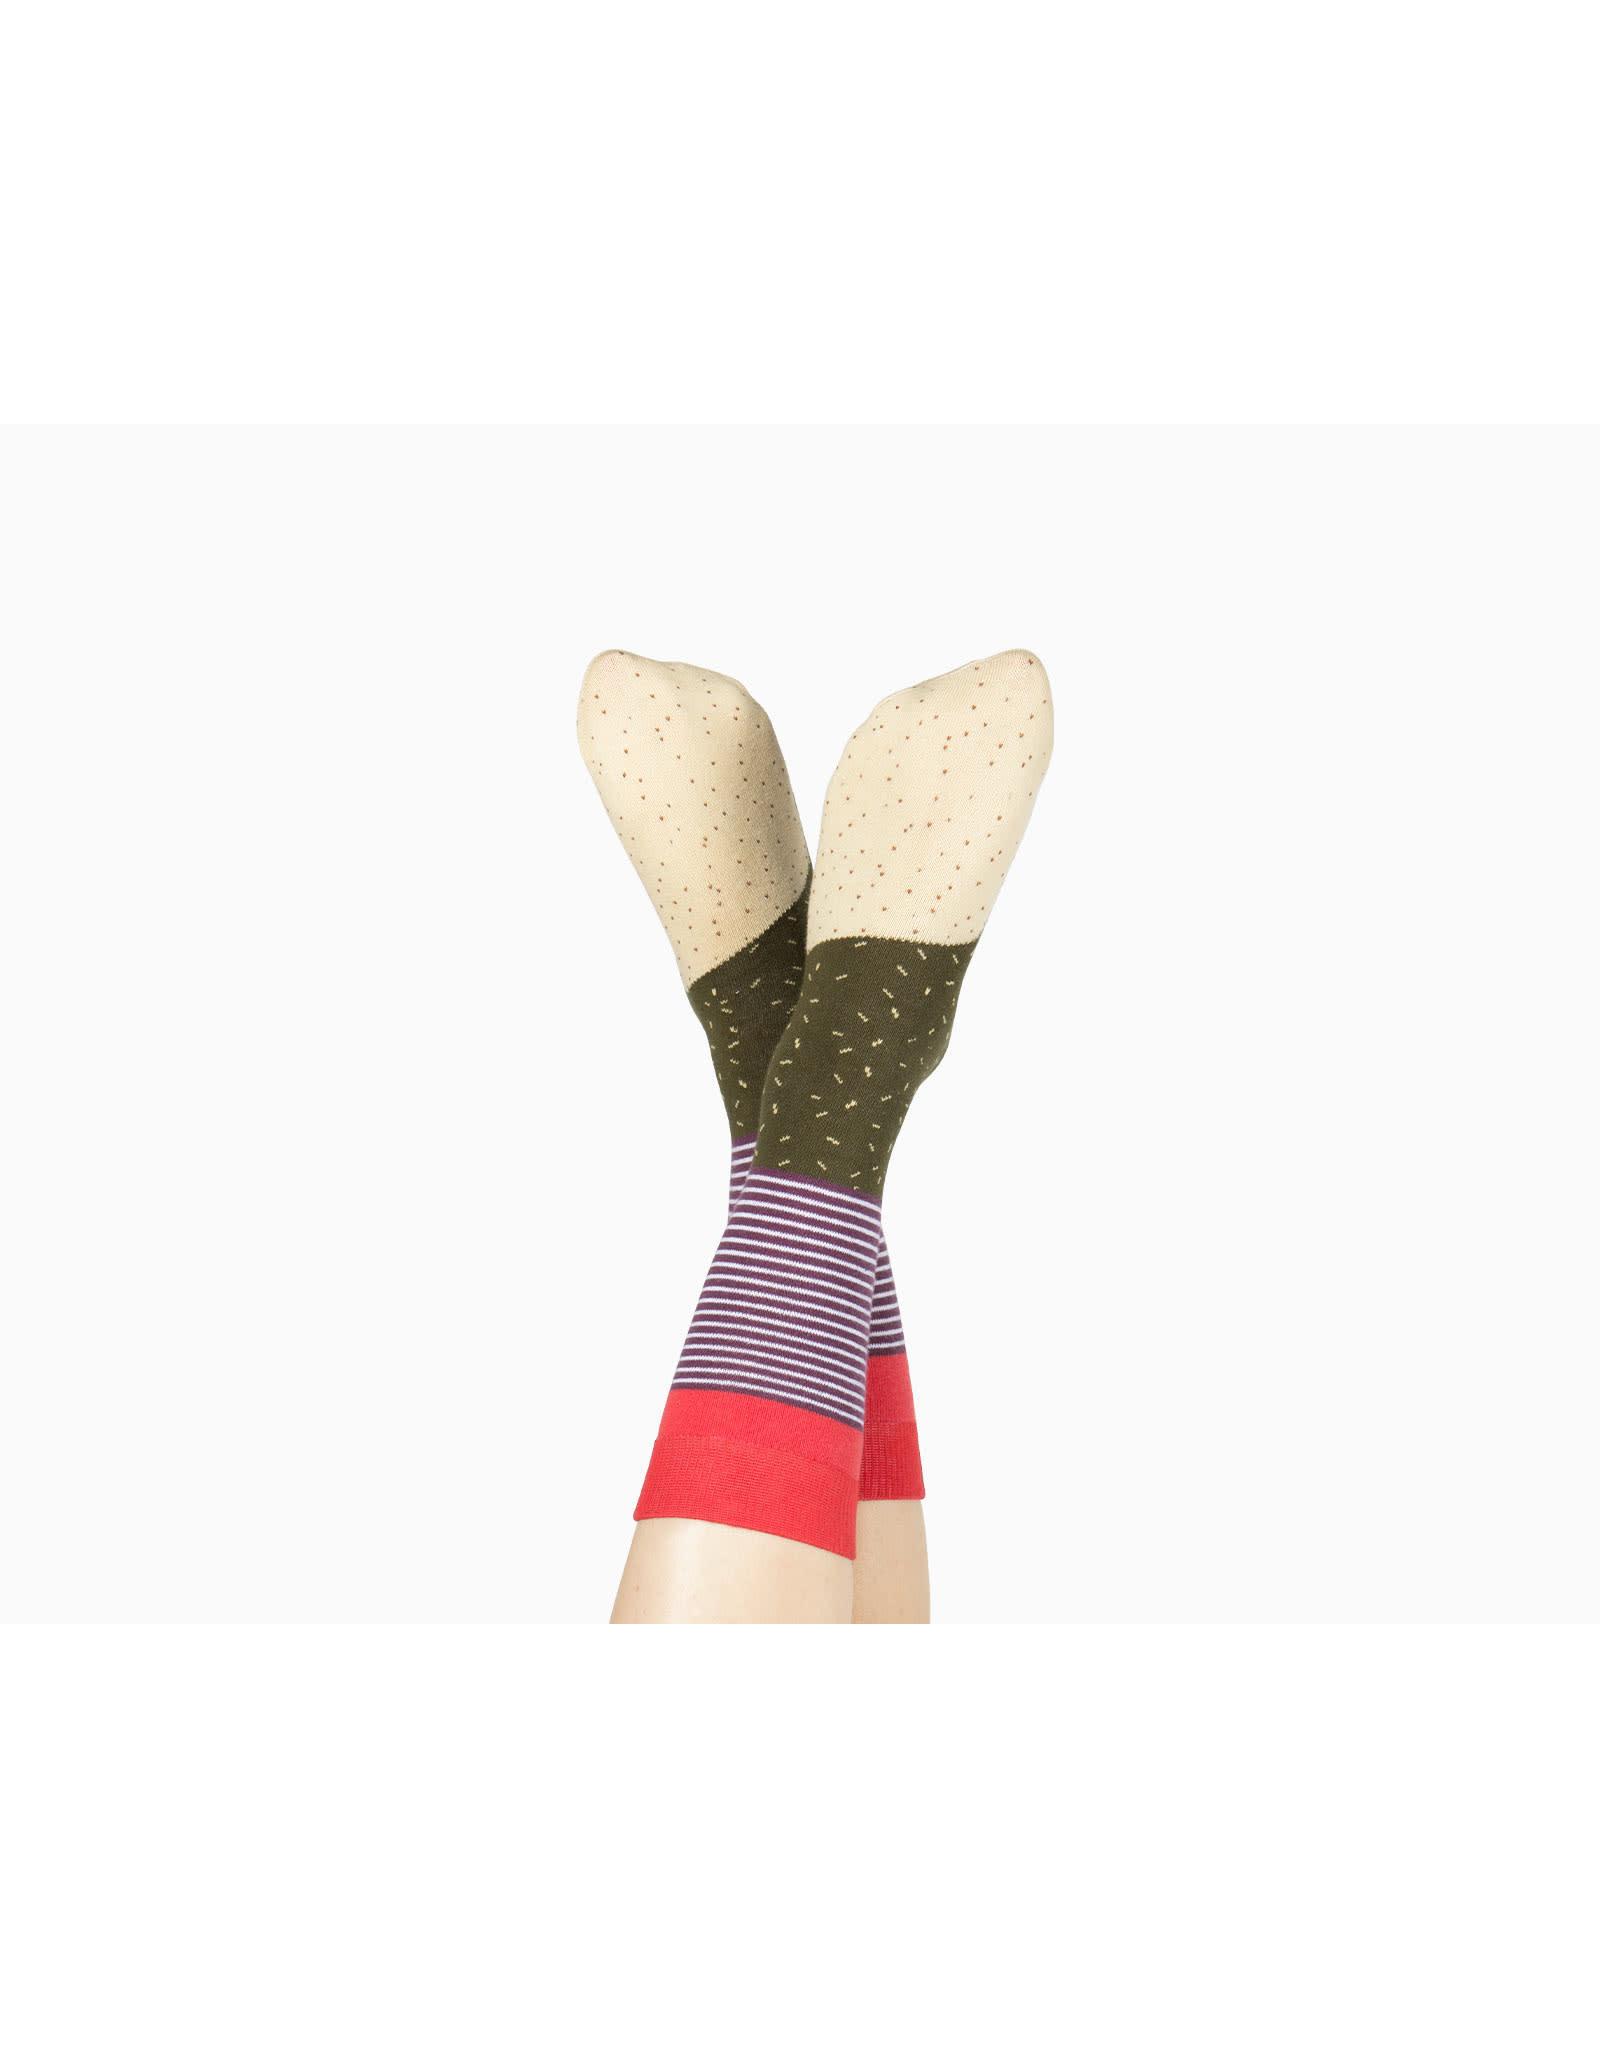 socks with burrito design